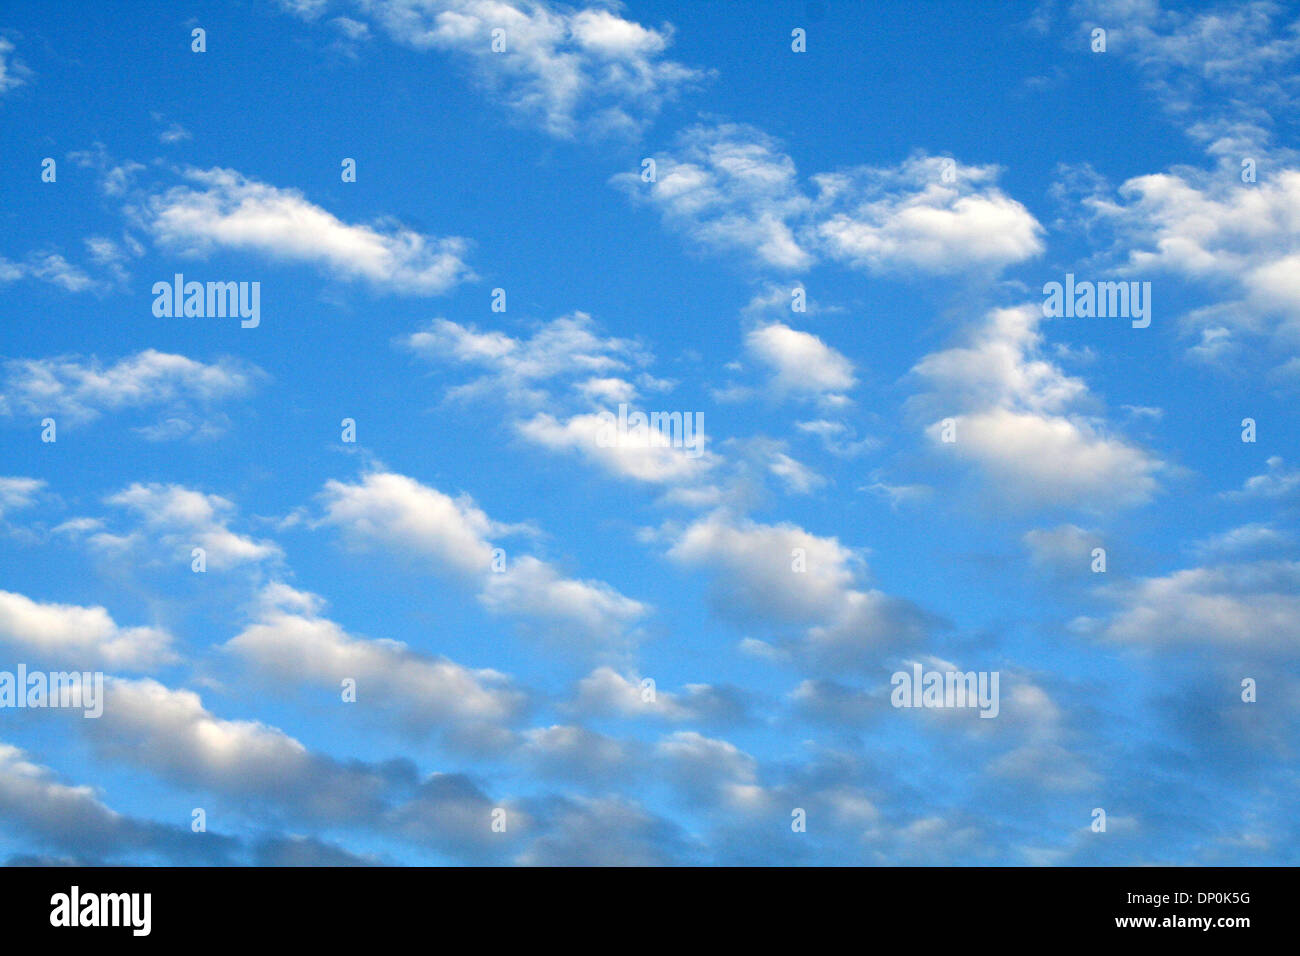 Konapictures Stockfotos & Konapictures Bilder - Alamy